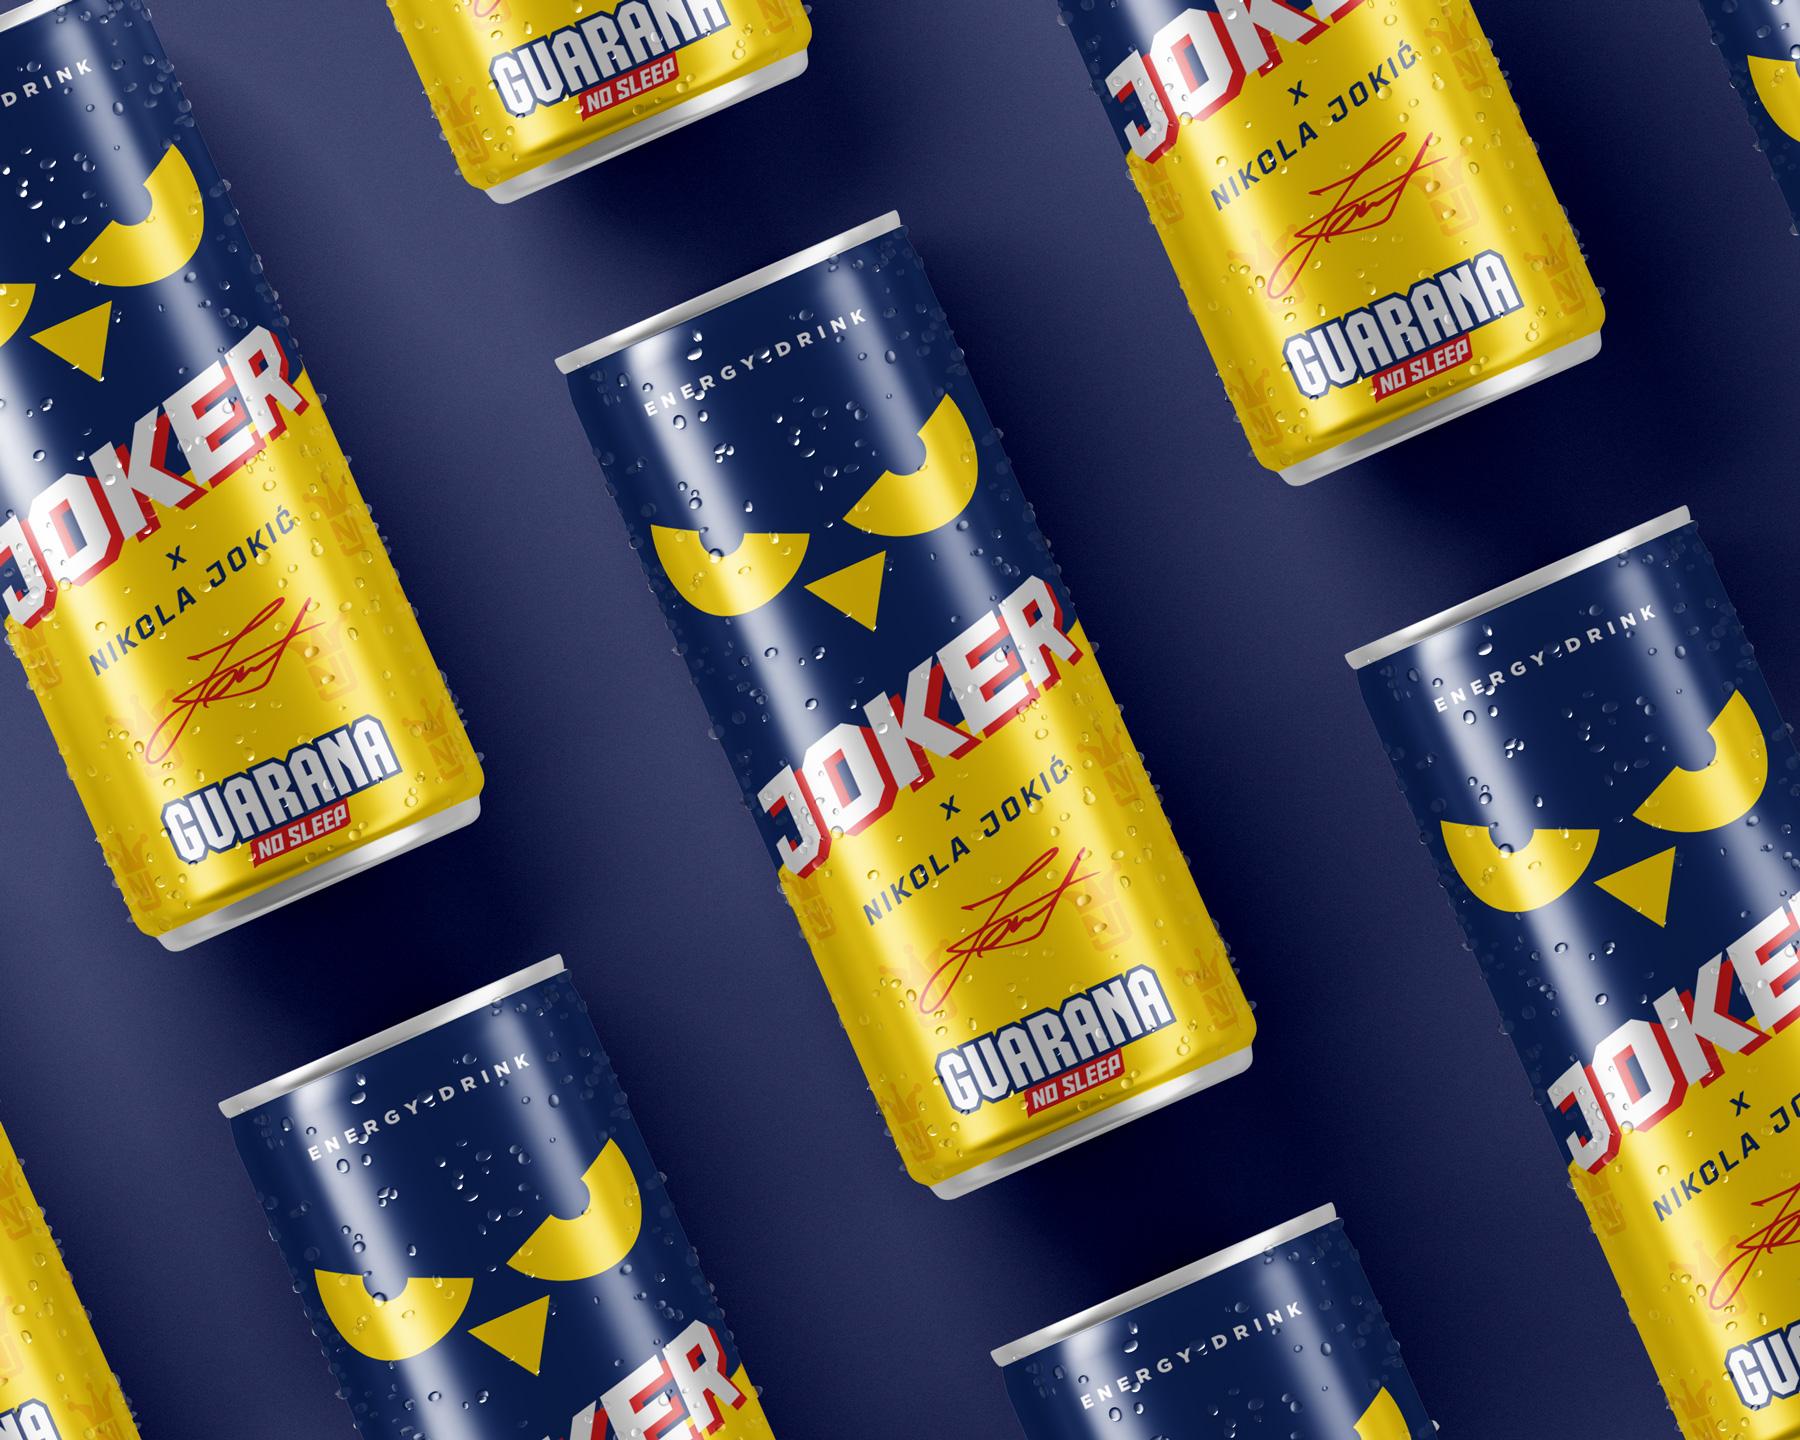 NUL Apps Belgrade Create Brand and Packaging forfor Guarana Joker Energy Drinks